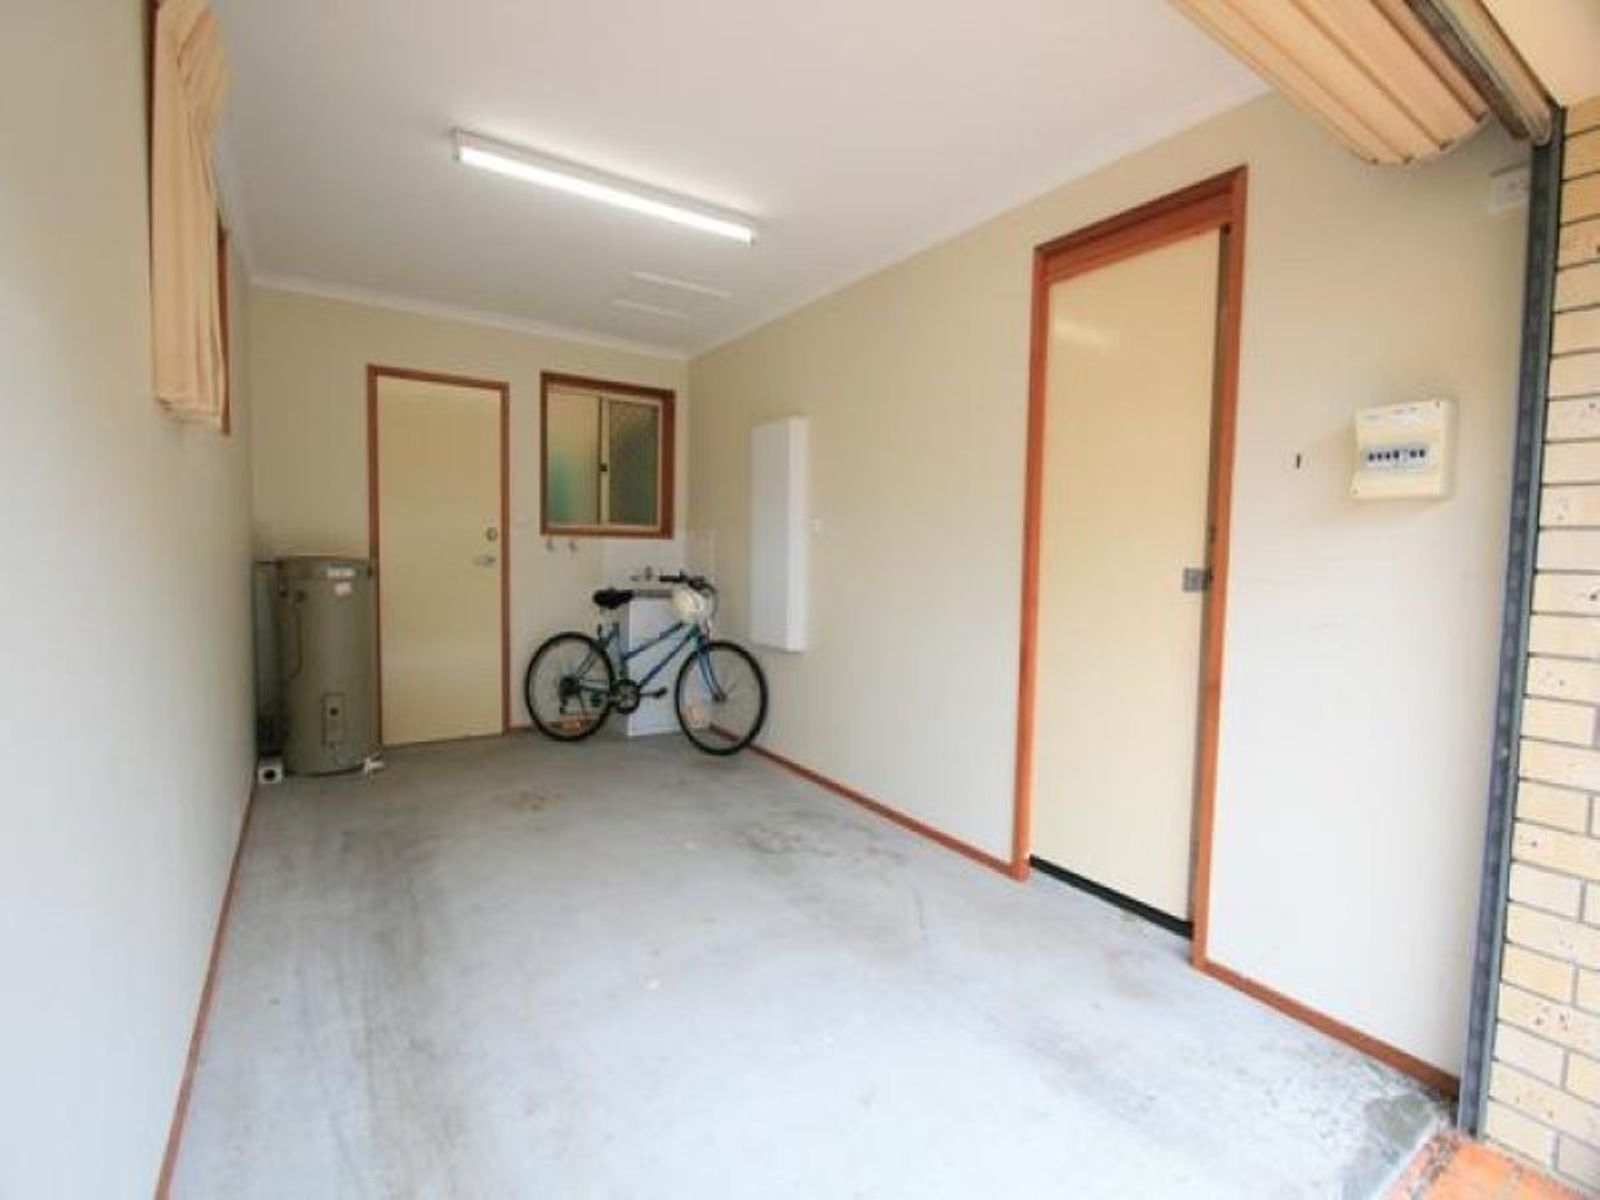 8/9 Blake Street, Southport, QLD 4215